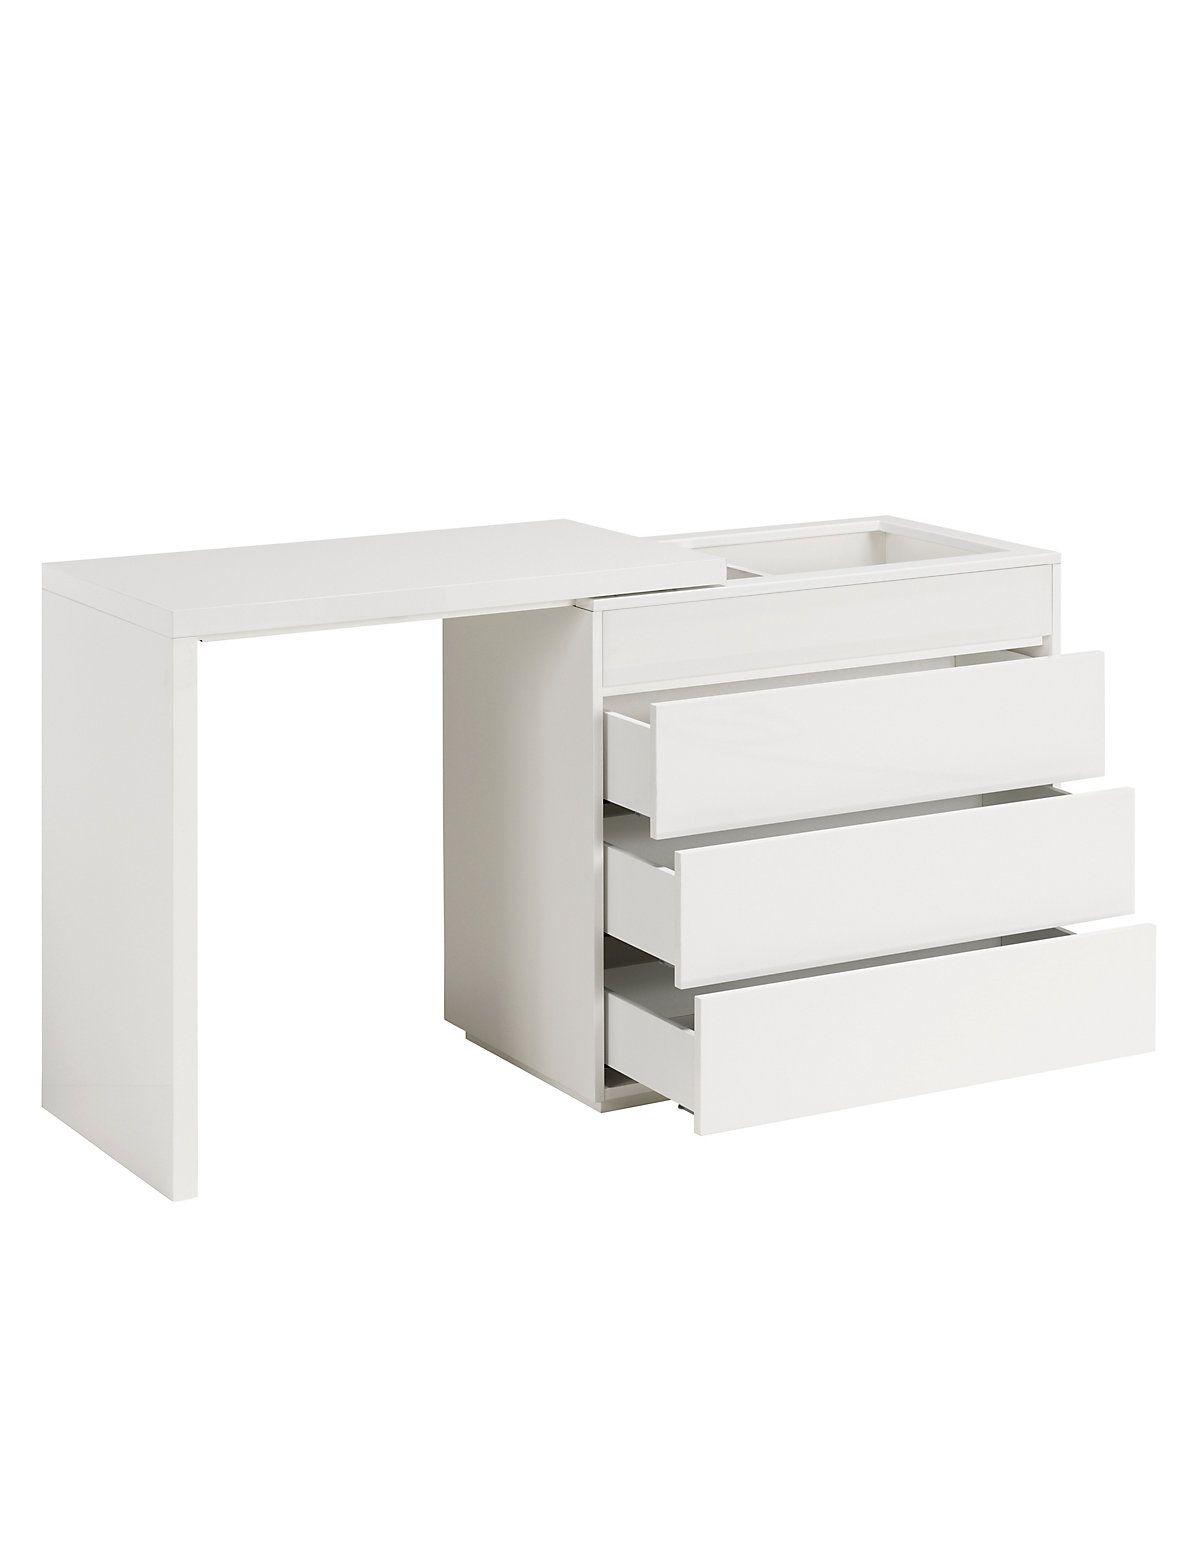 Best Lyra Dressing Table Diy Dressing Tables Dressing Table 400 x 300